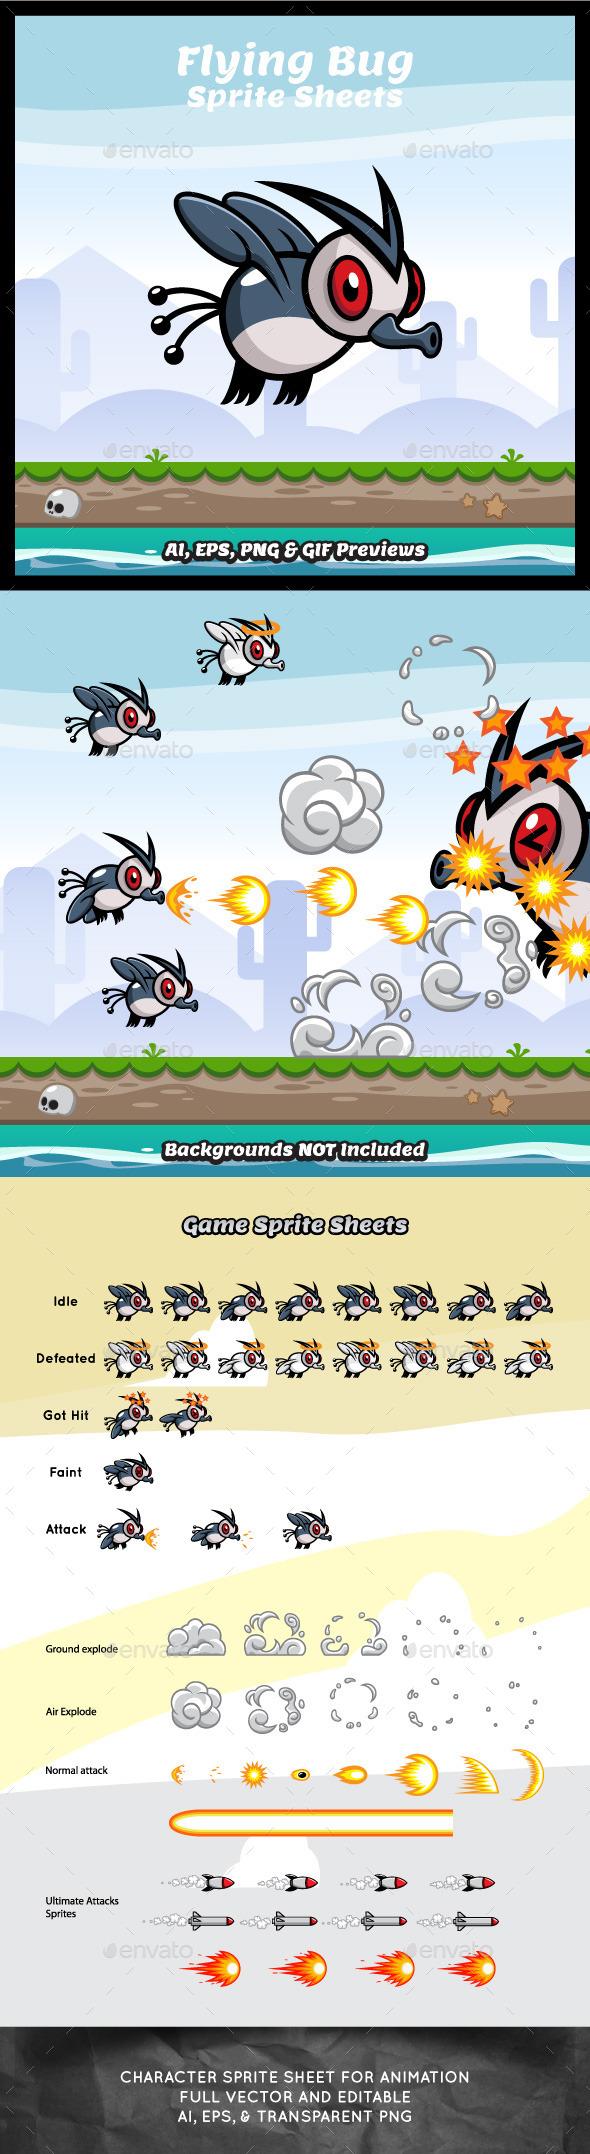 Flying Bug Game Character Sprite Sheets - Sprites Game Assets